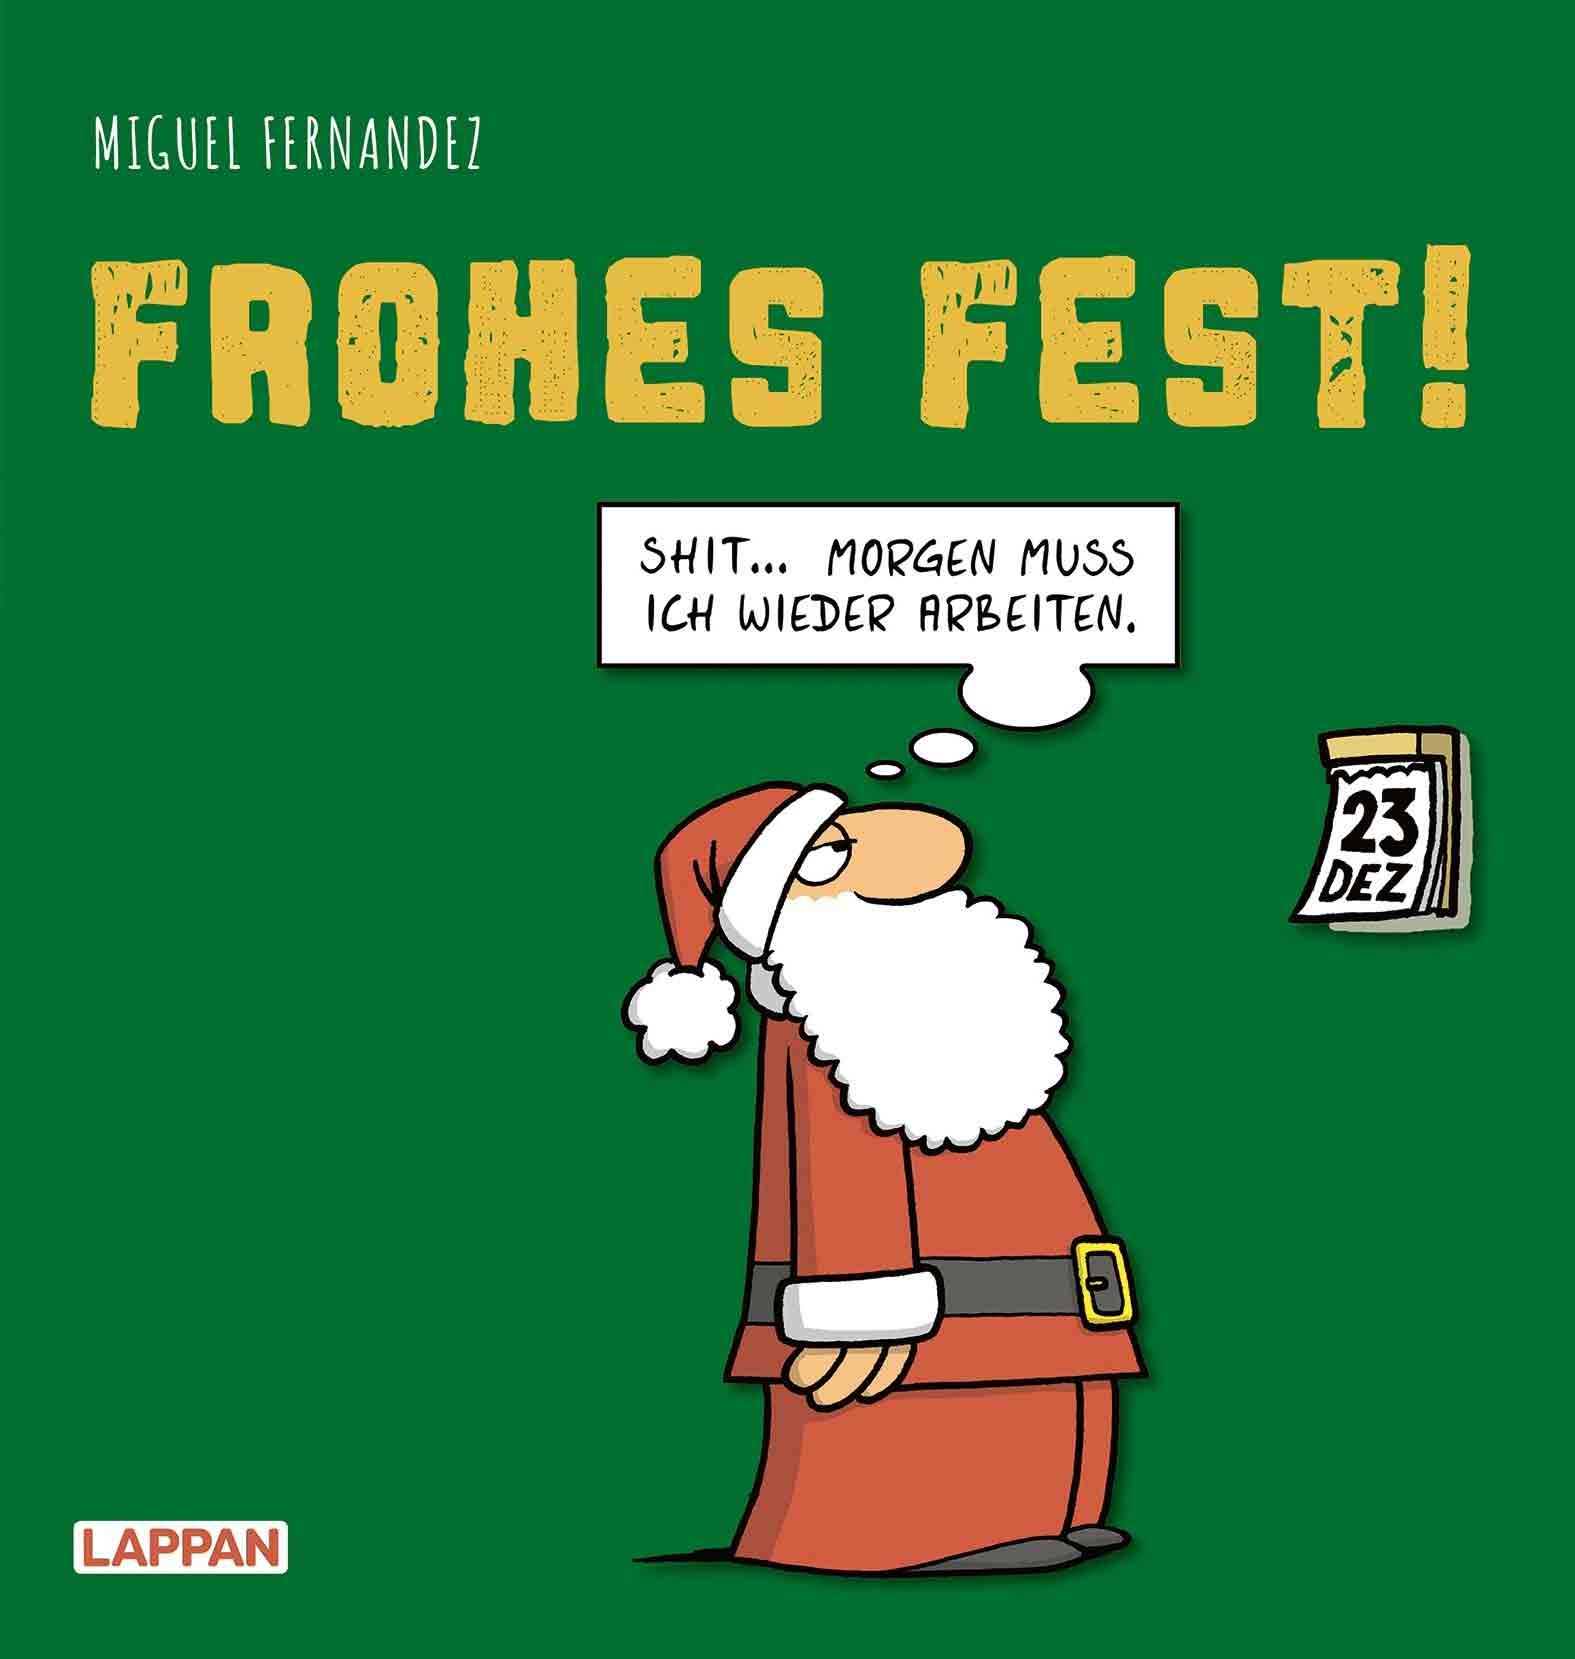 Miguel Fernandez - Frohes Fest!